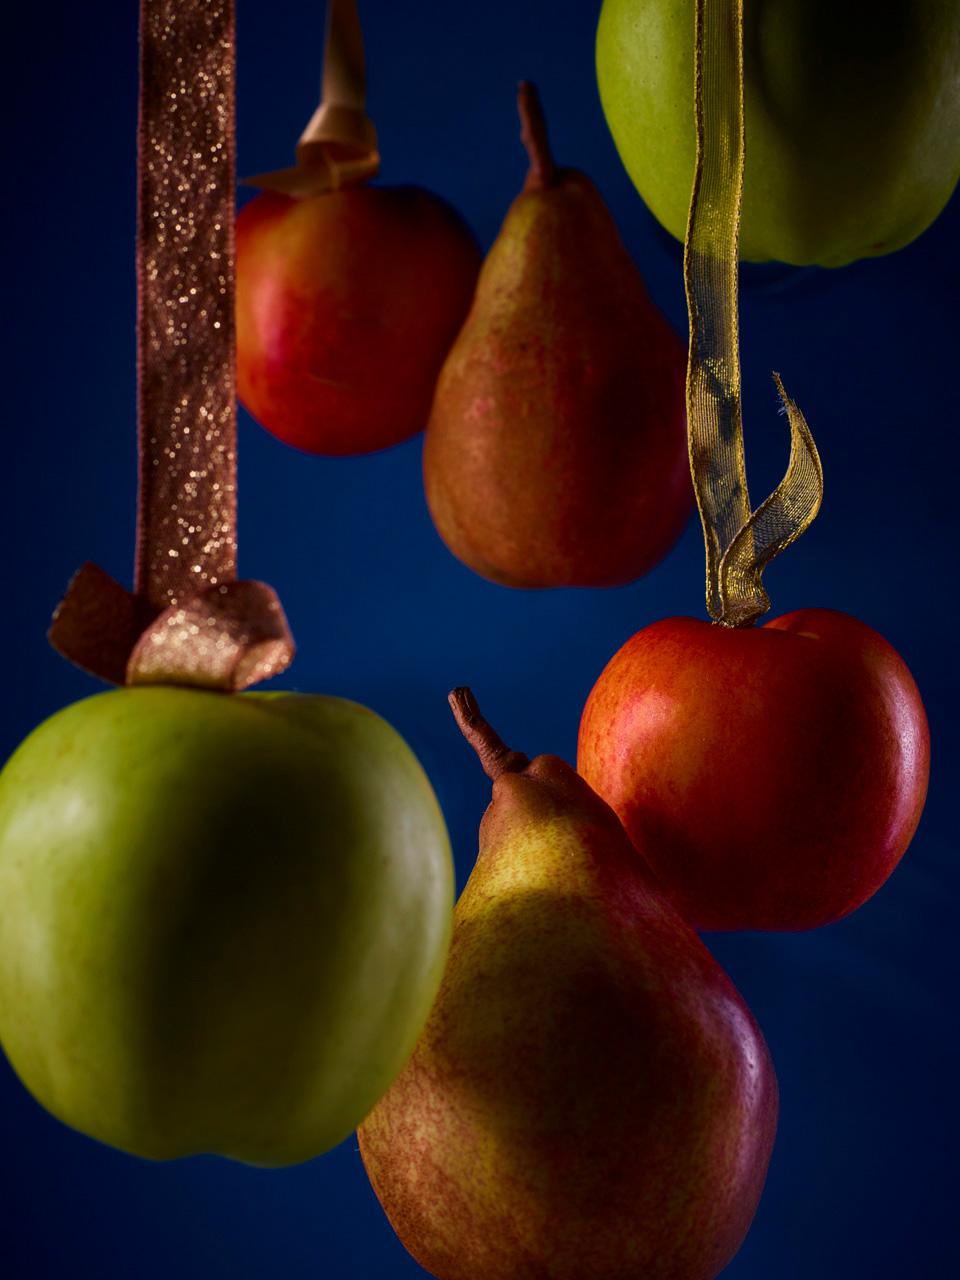 Angus McDonald Photography - Fruit Drops